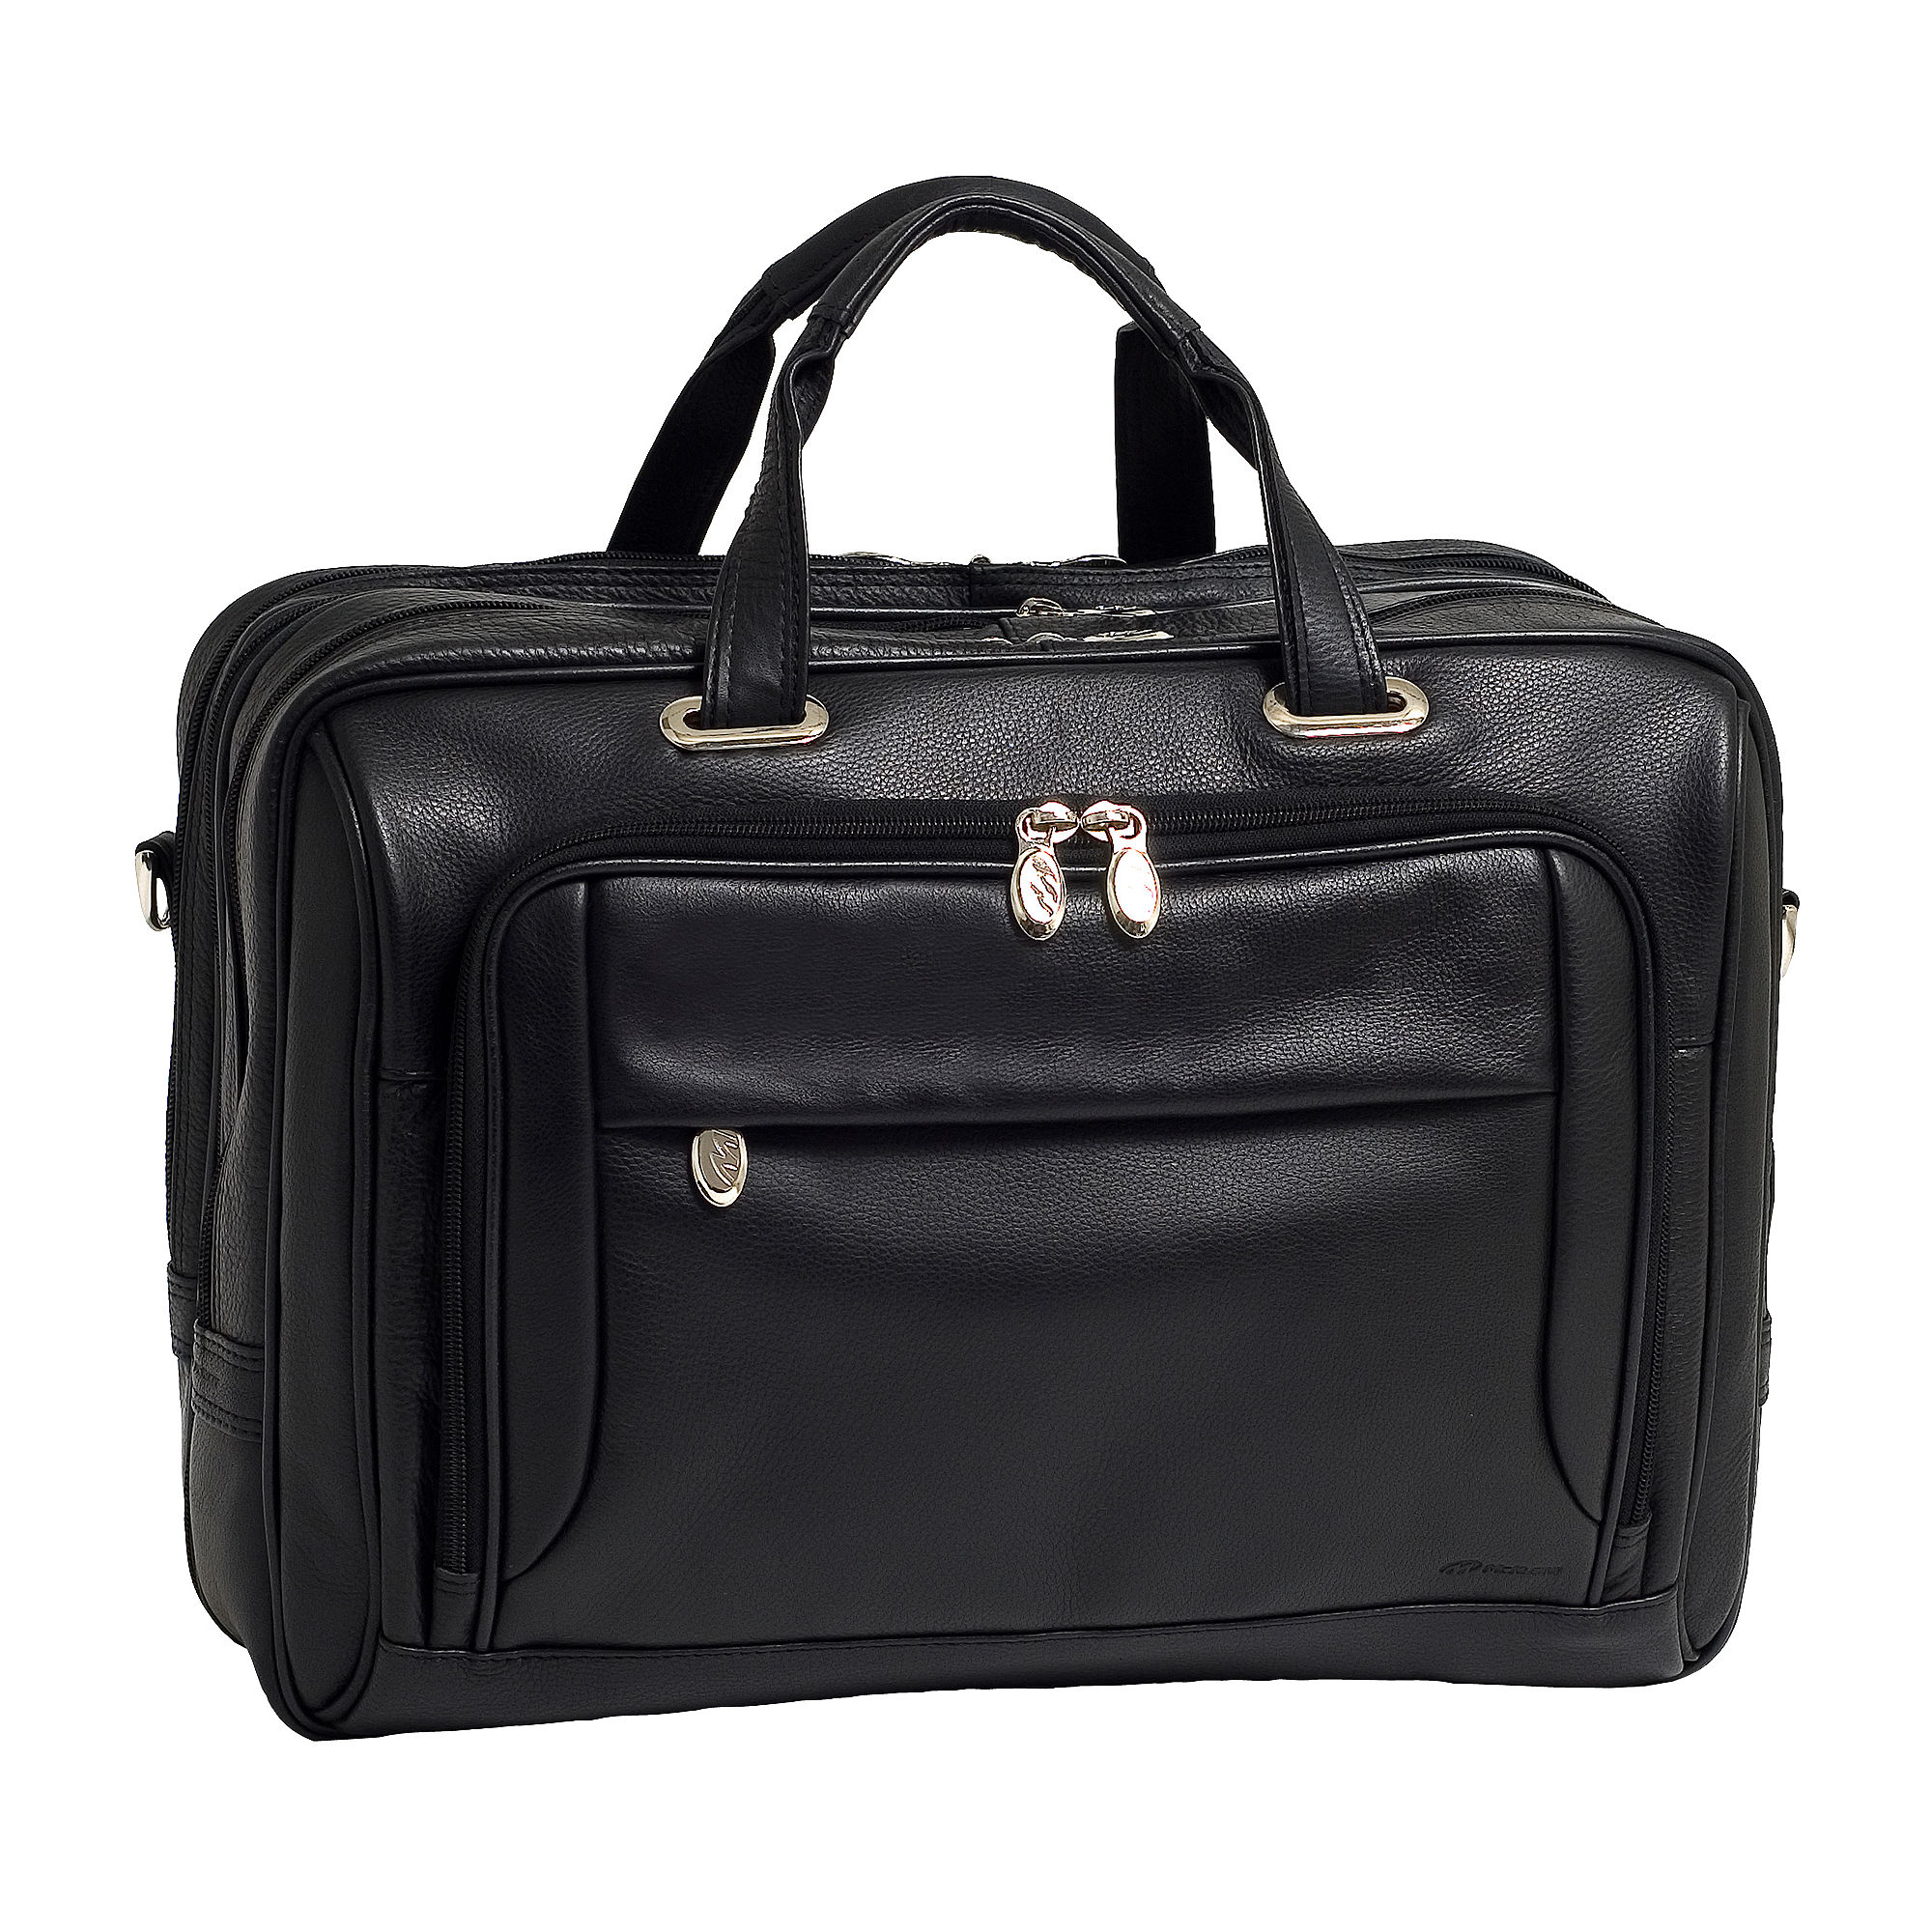 "McKleinUSA West Loop 15.6"" Leather Expandable Double Compartment Briefcase"